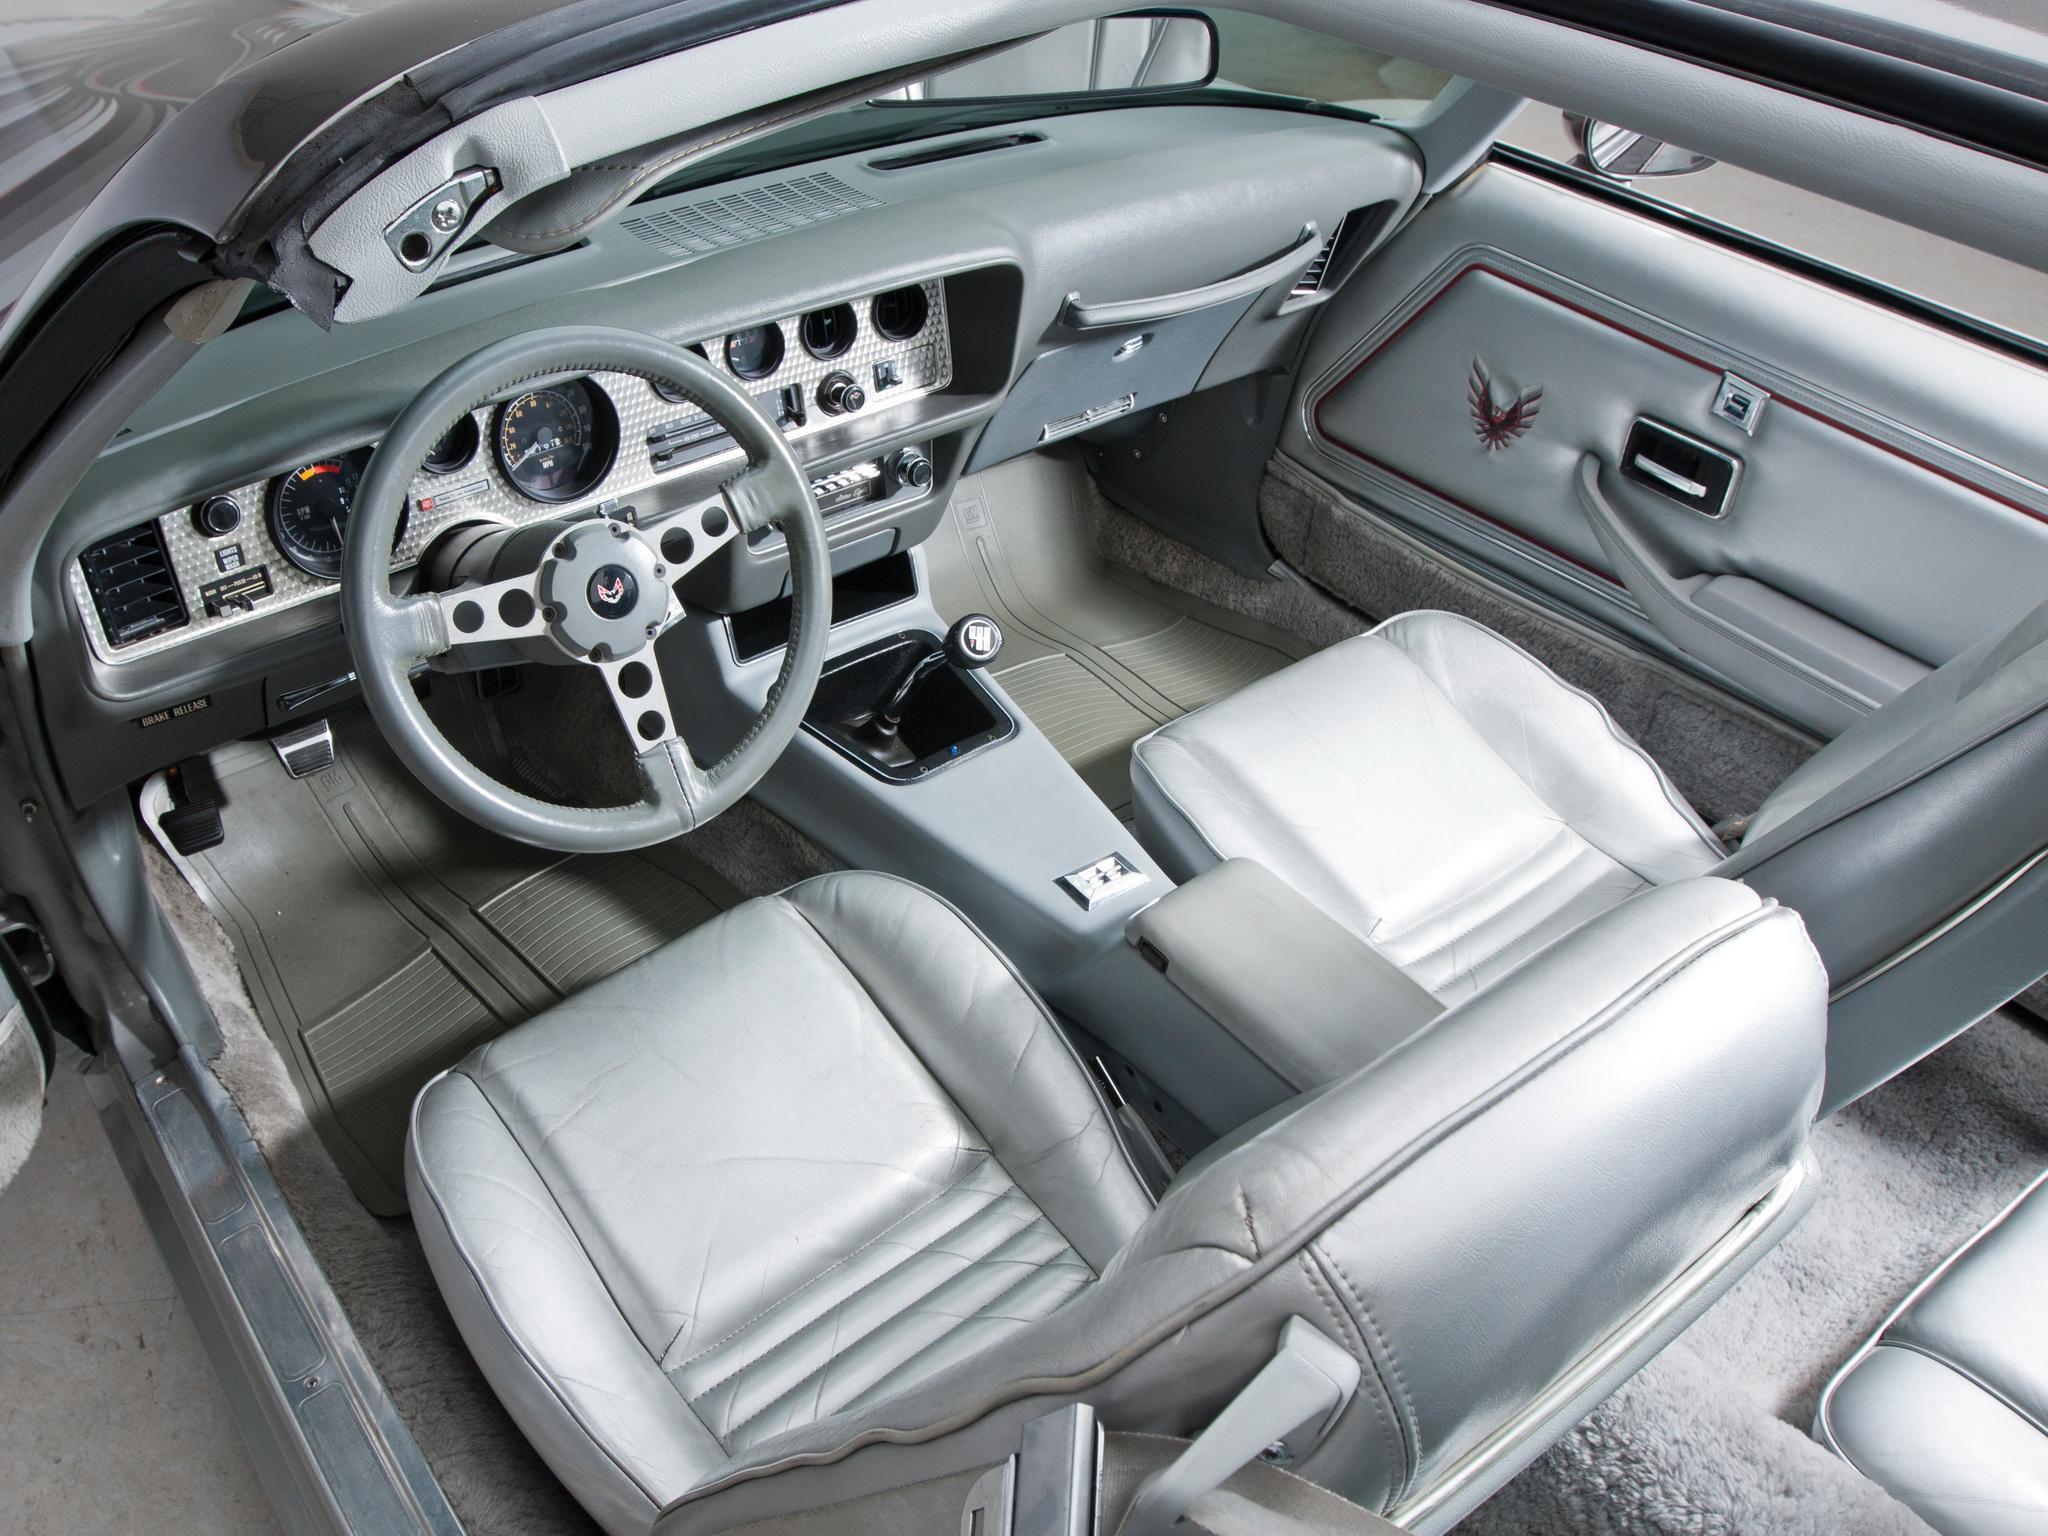 1979 Pontiac Firebird Trans Am T-A 6-6 L78 muscle classic interior